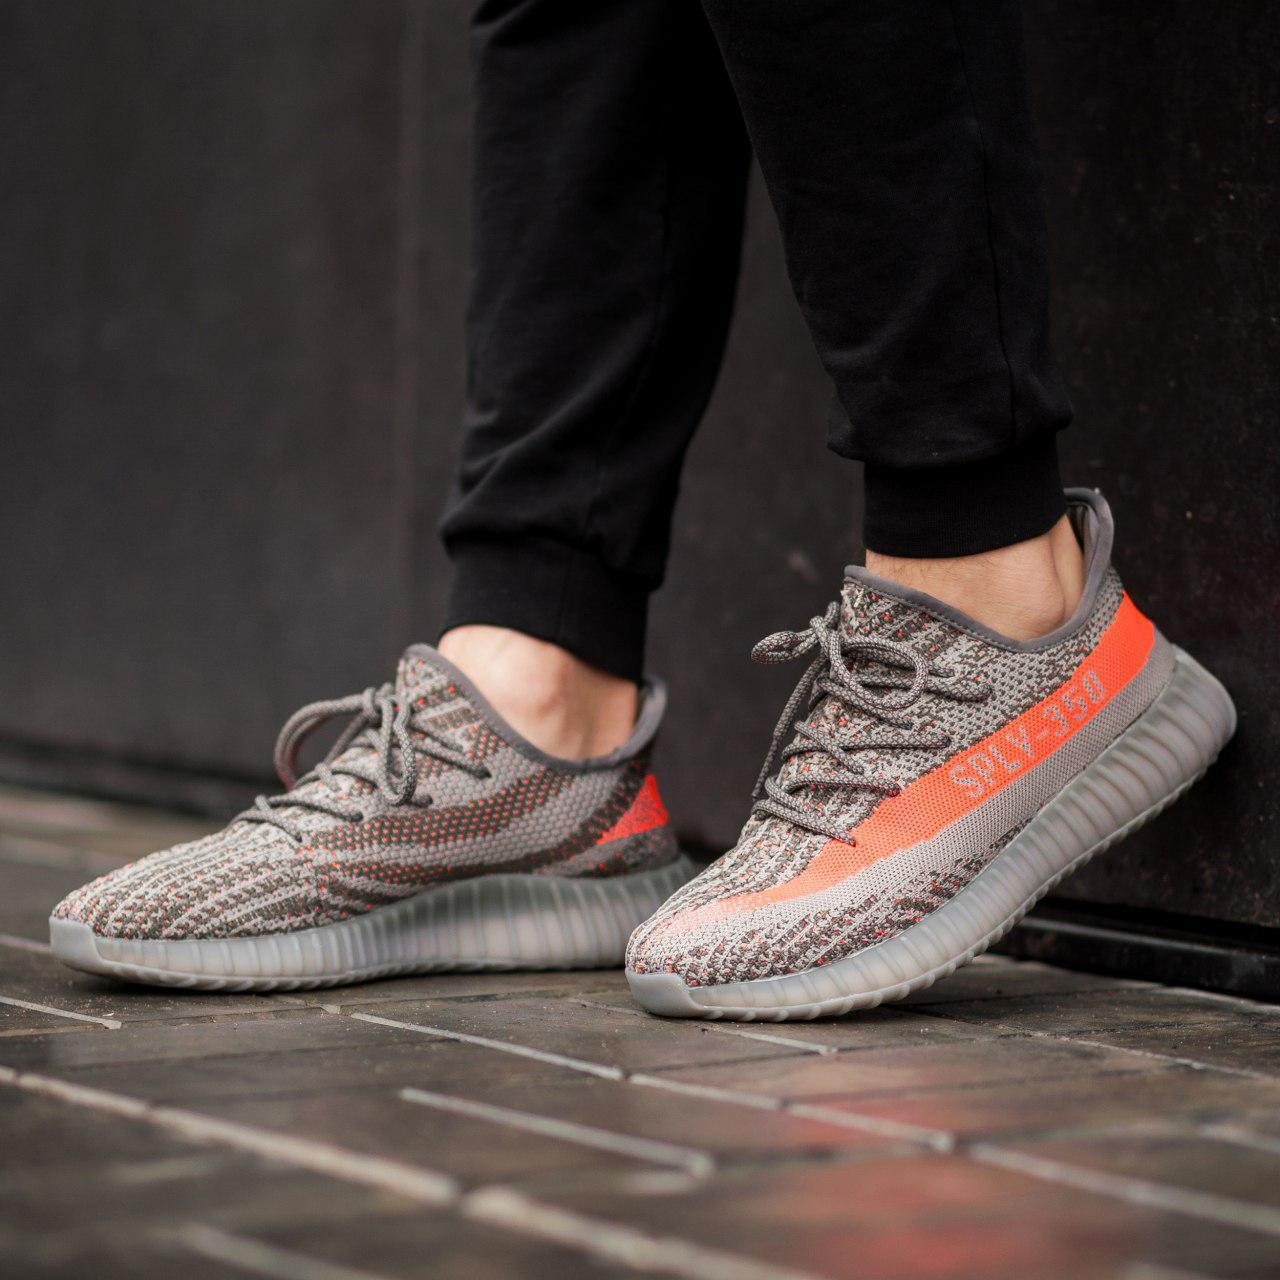 Мужские кроссовки Adidas Yeezy Boost 350 Gray (Реплика ААА+)